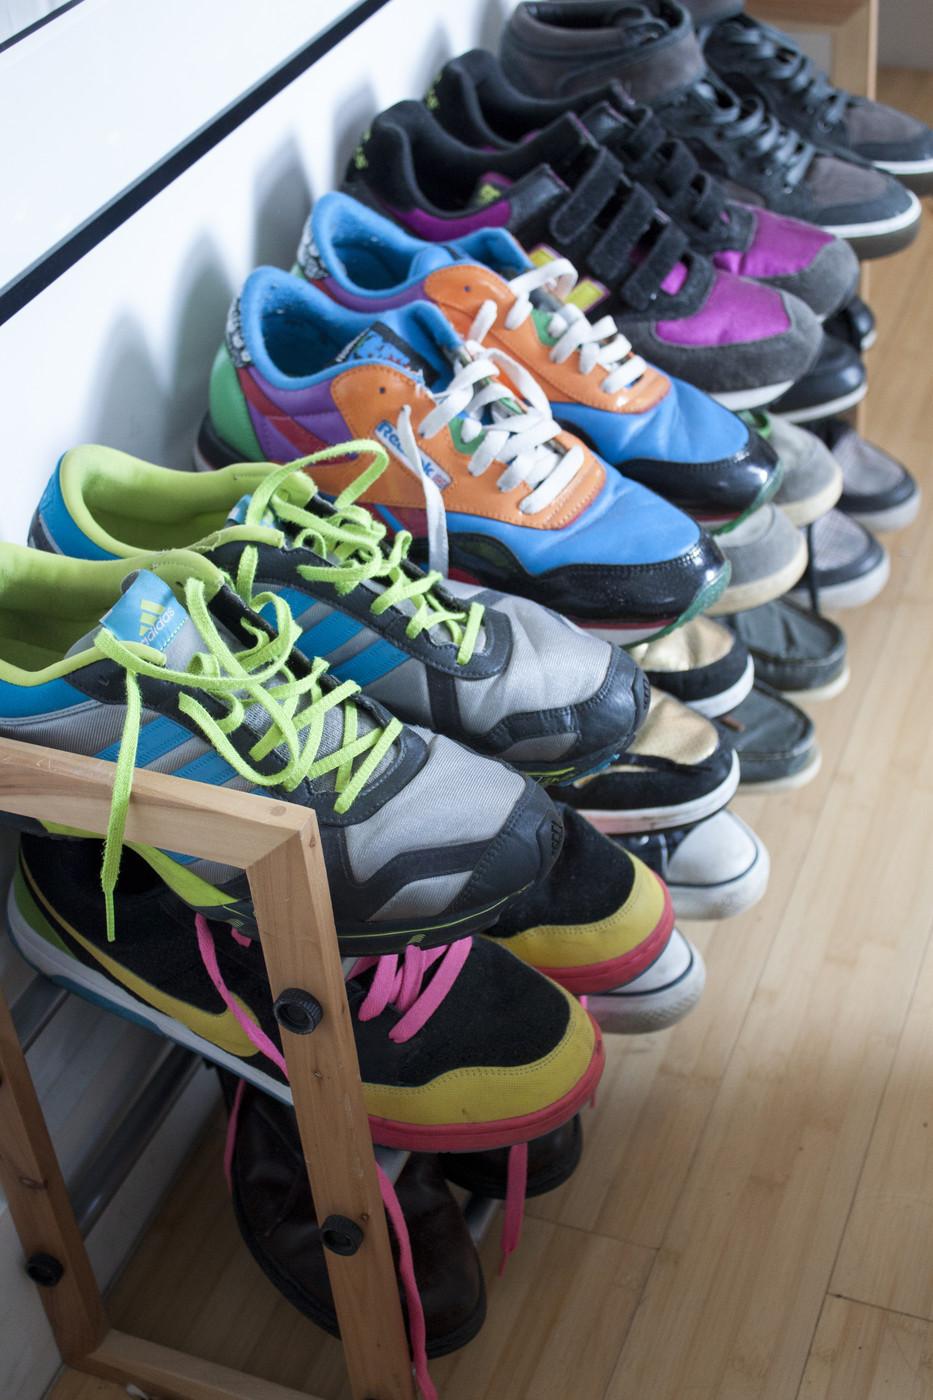 для хранения обуви